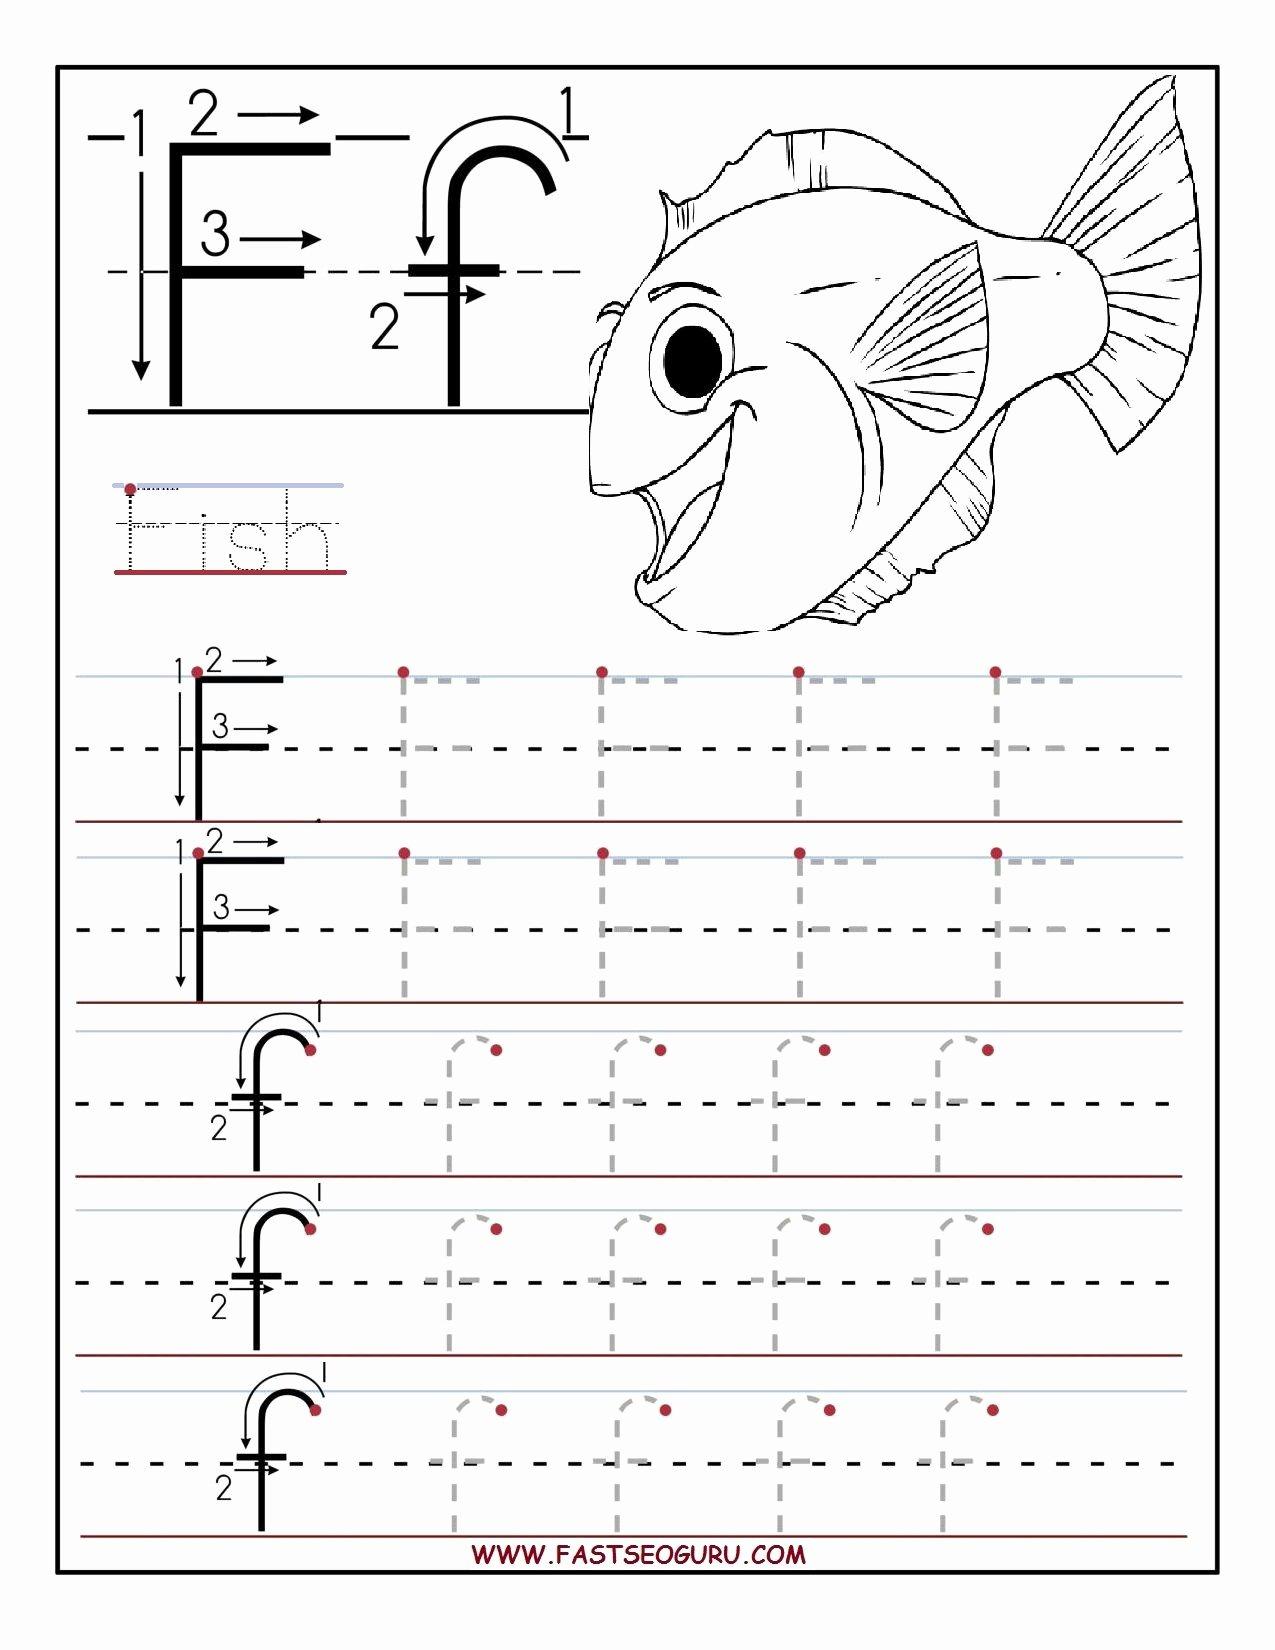 Free Printable Letter F Worksheets for Preschoolers New Printable Letter F Tracing Worksheets for Preschool